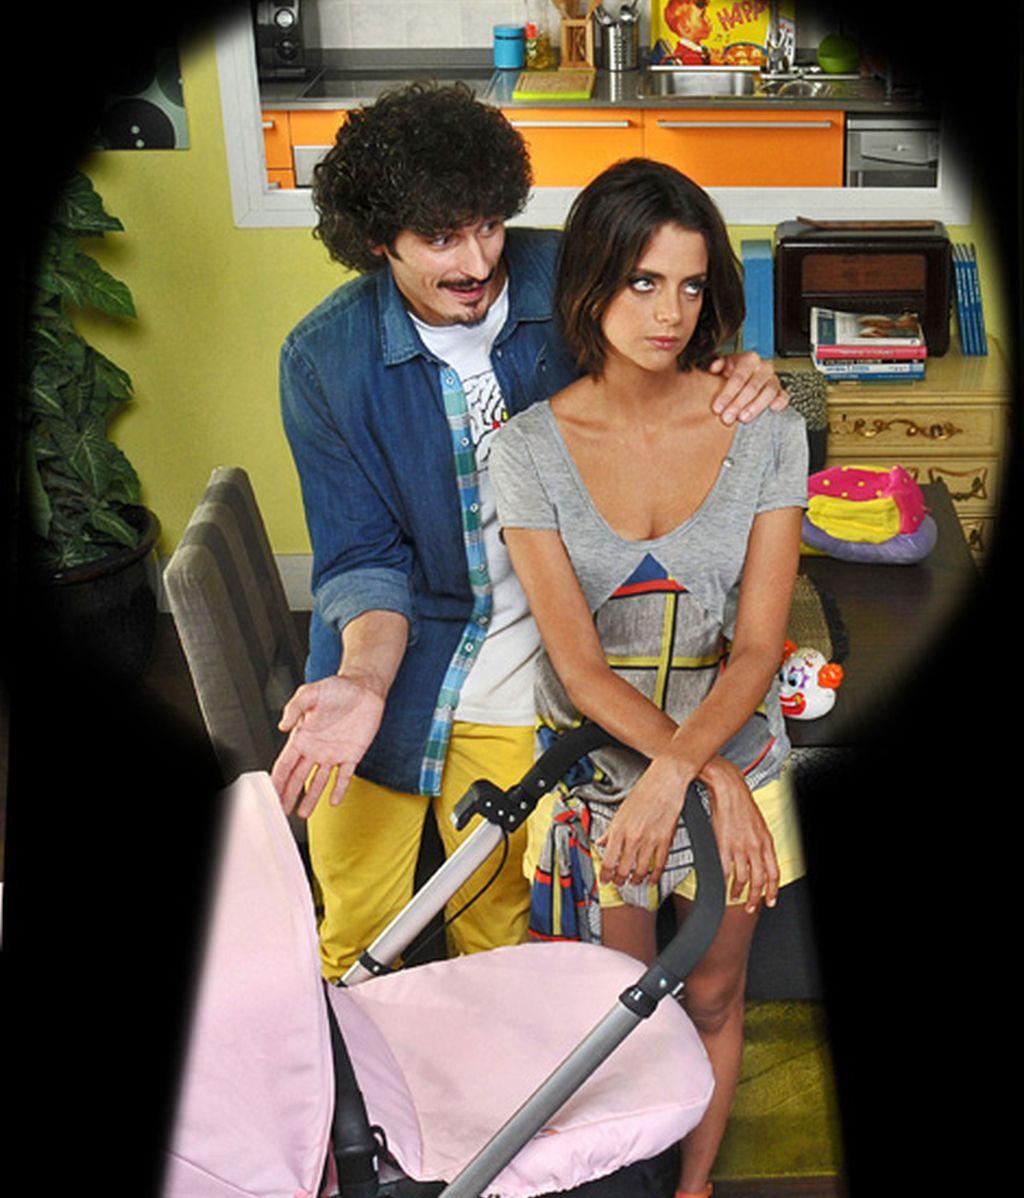 Antonio Pagudo y Macarena Gómez son Javier Maroto y Lola Trujillo